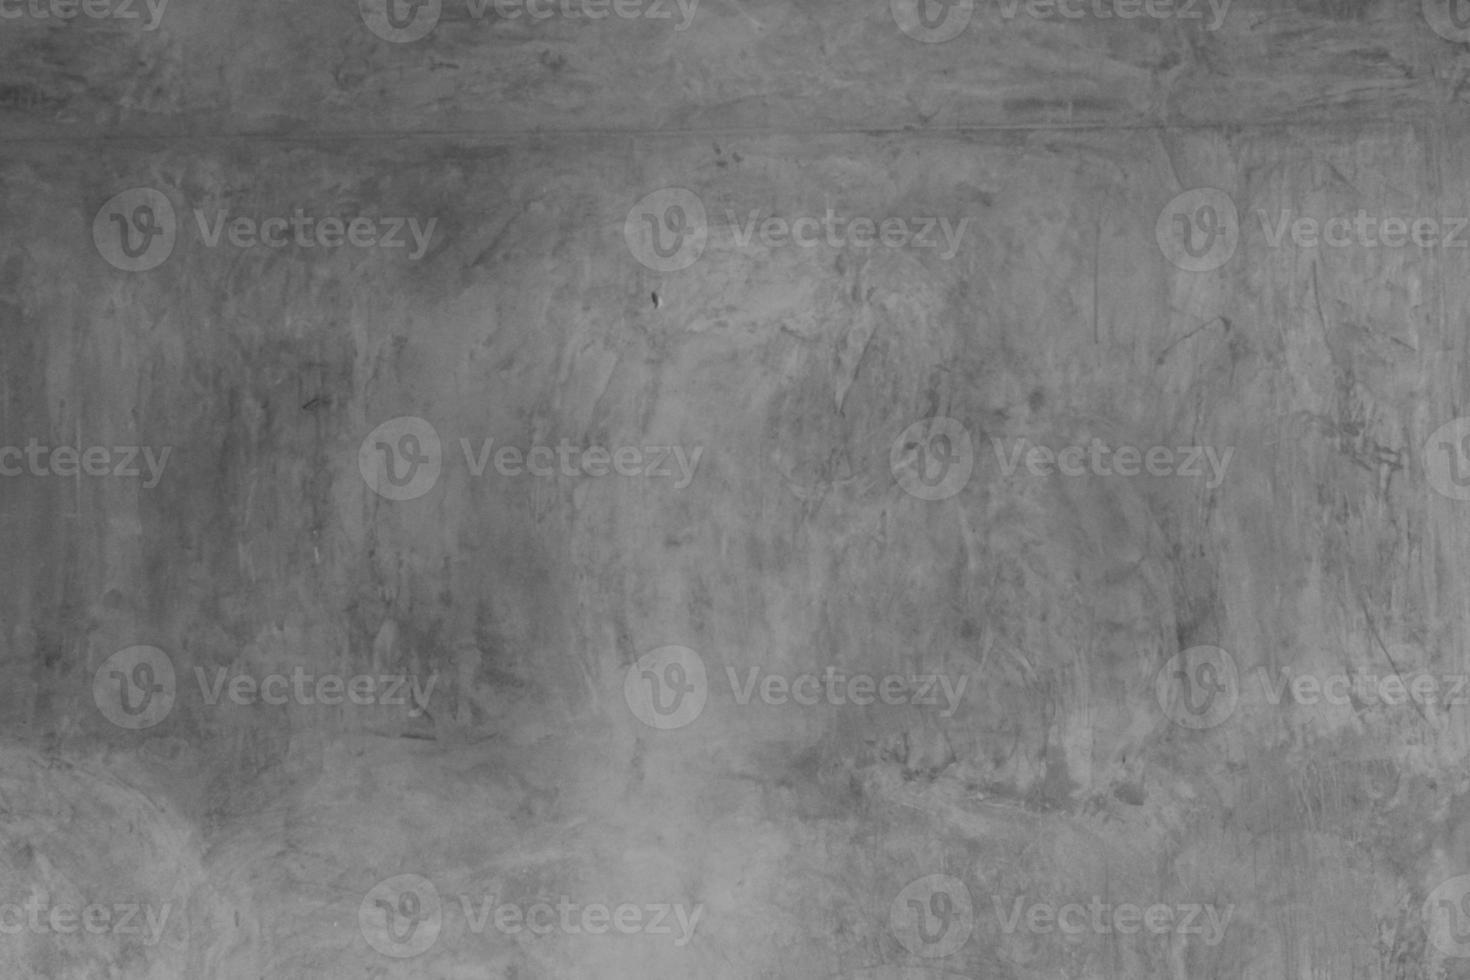 Textured concrete background photo